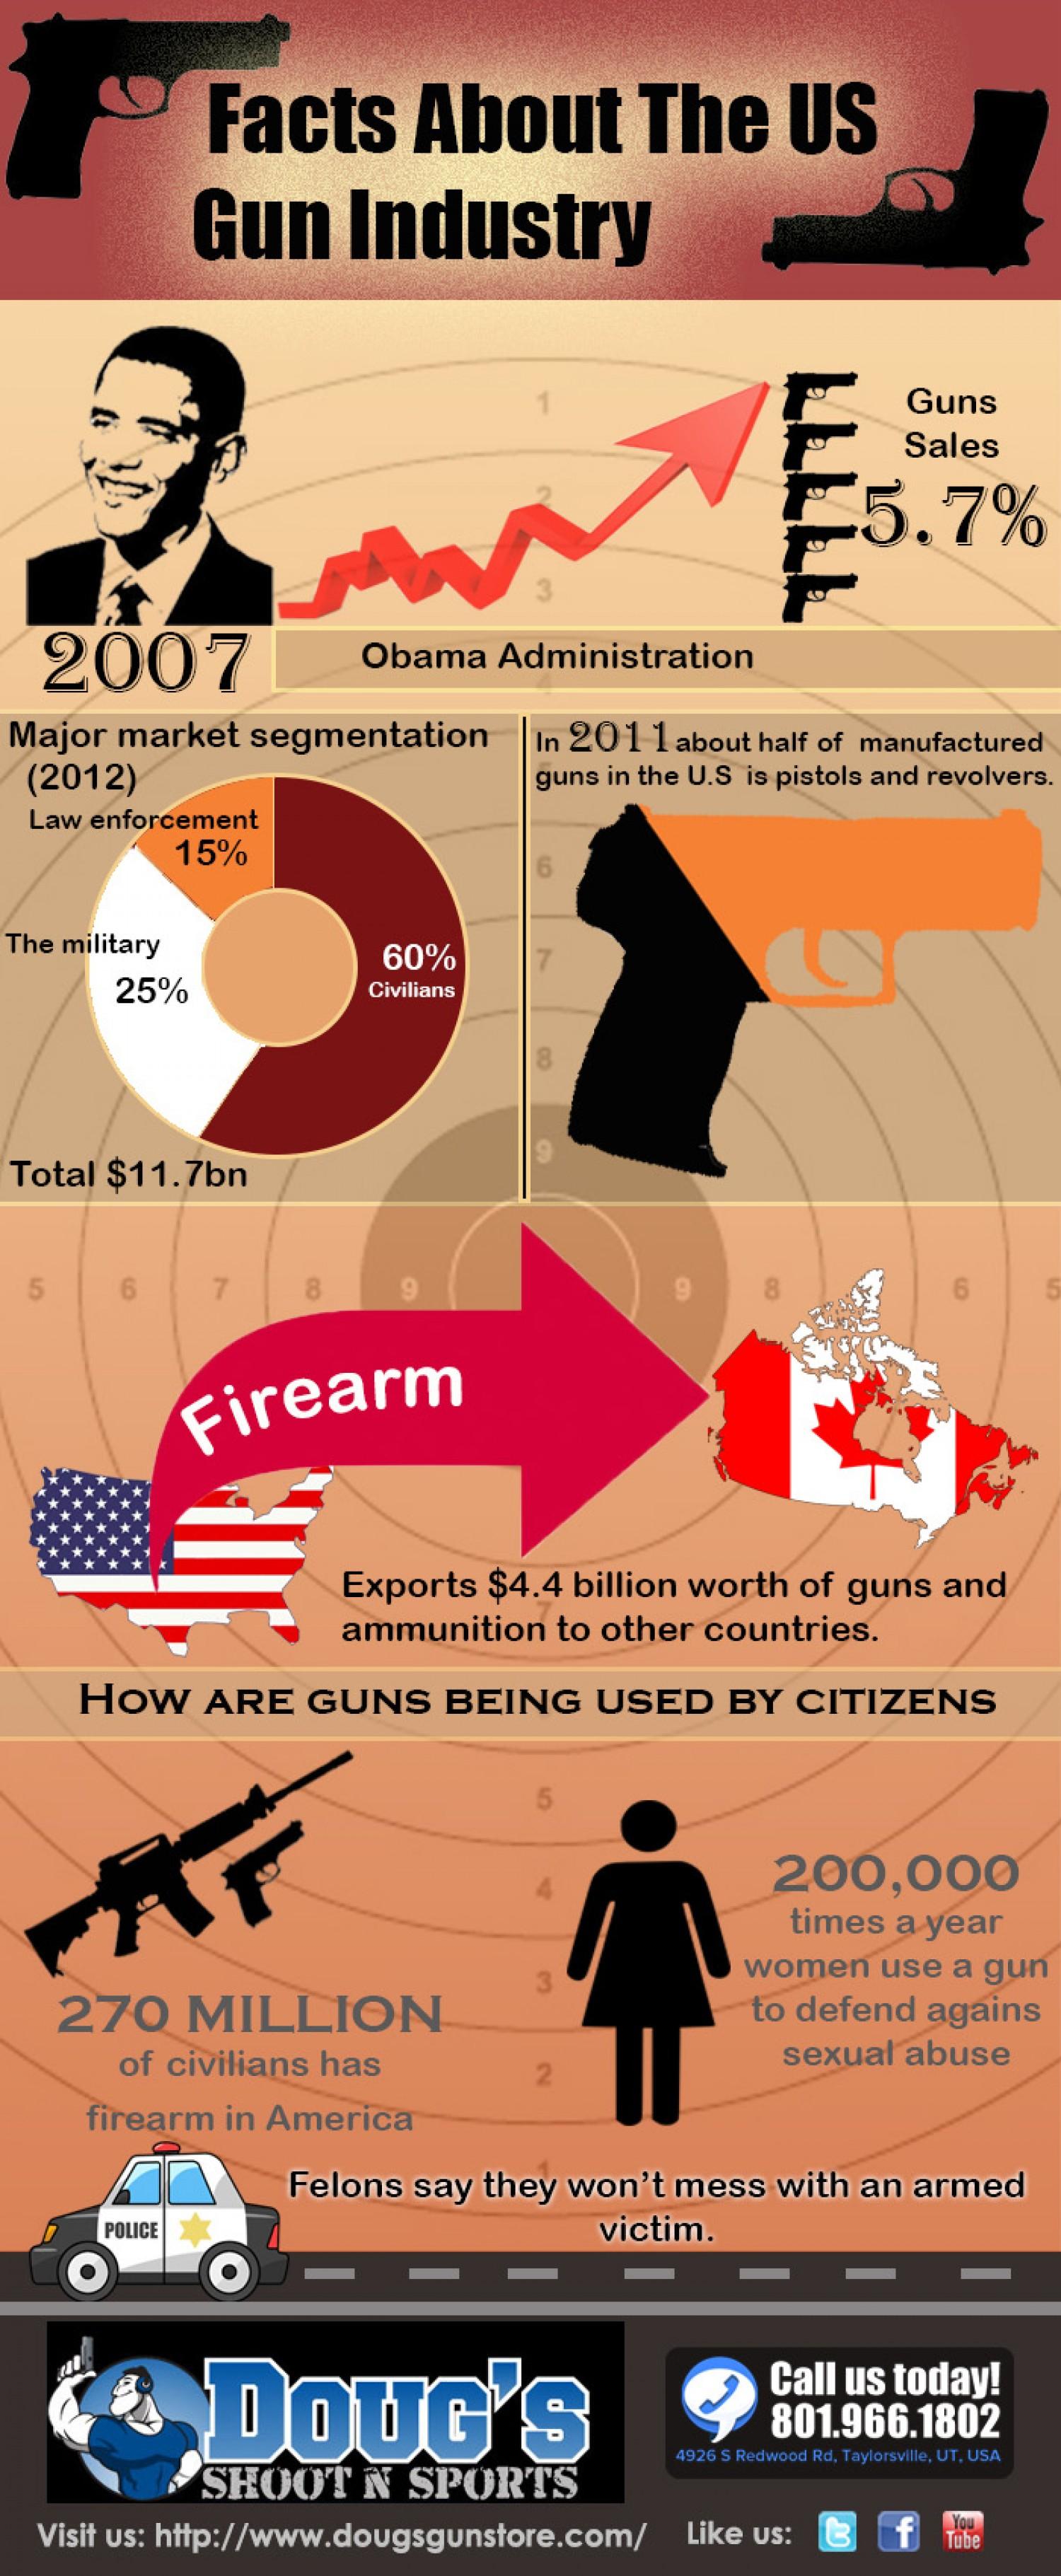 01 guns-in-the-usa_52fc21da1fdcd_w1500